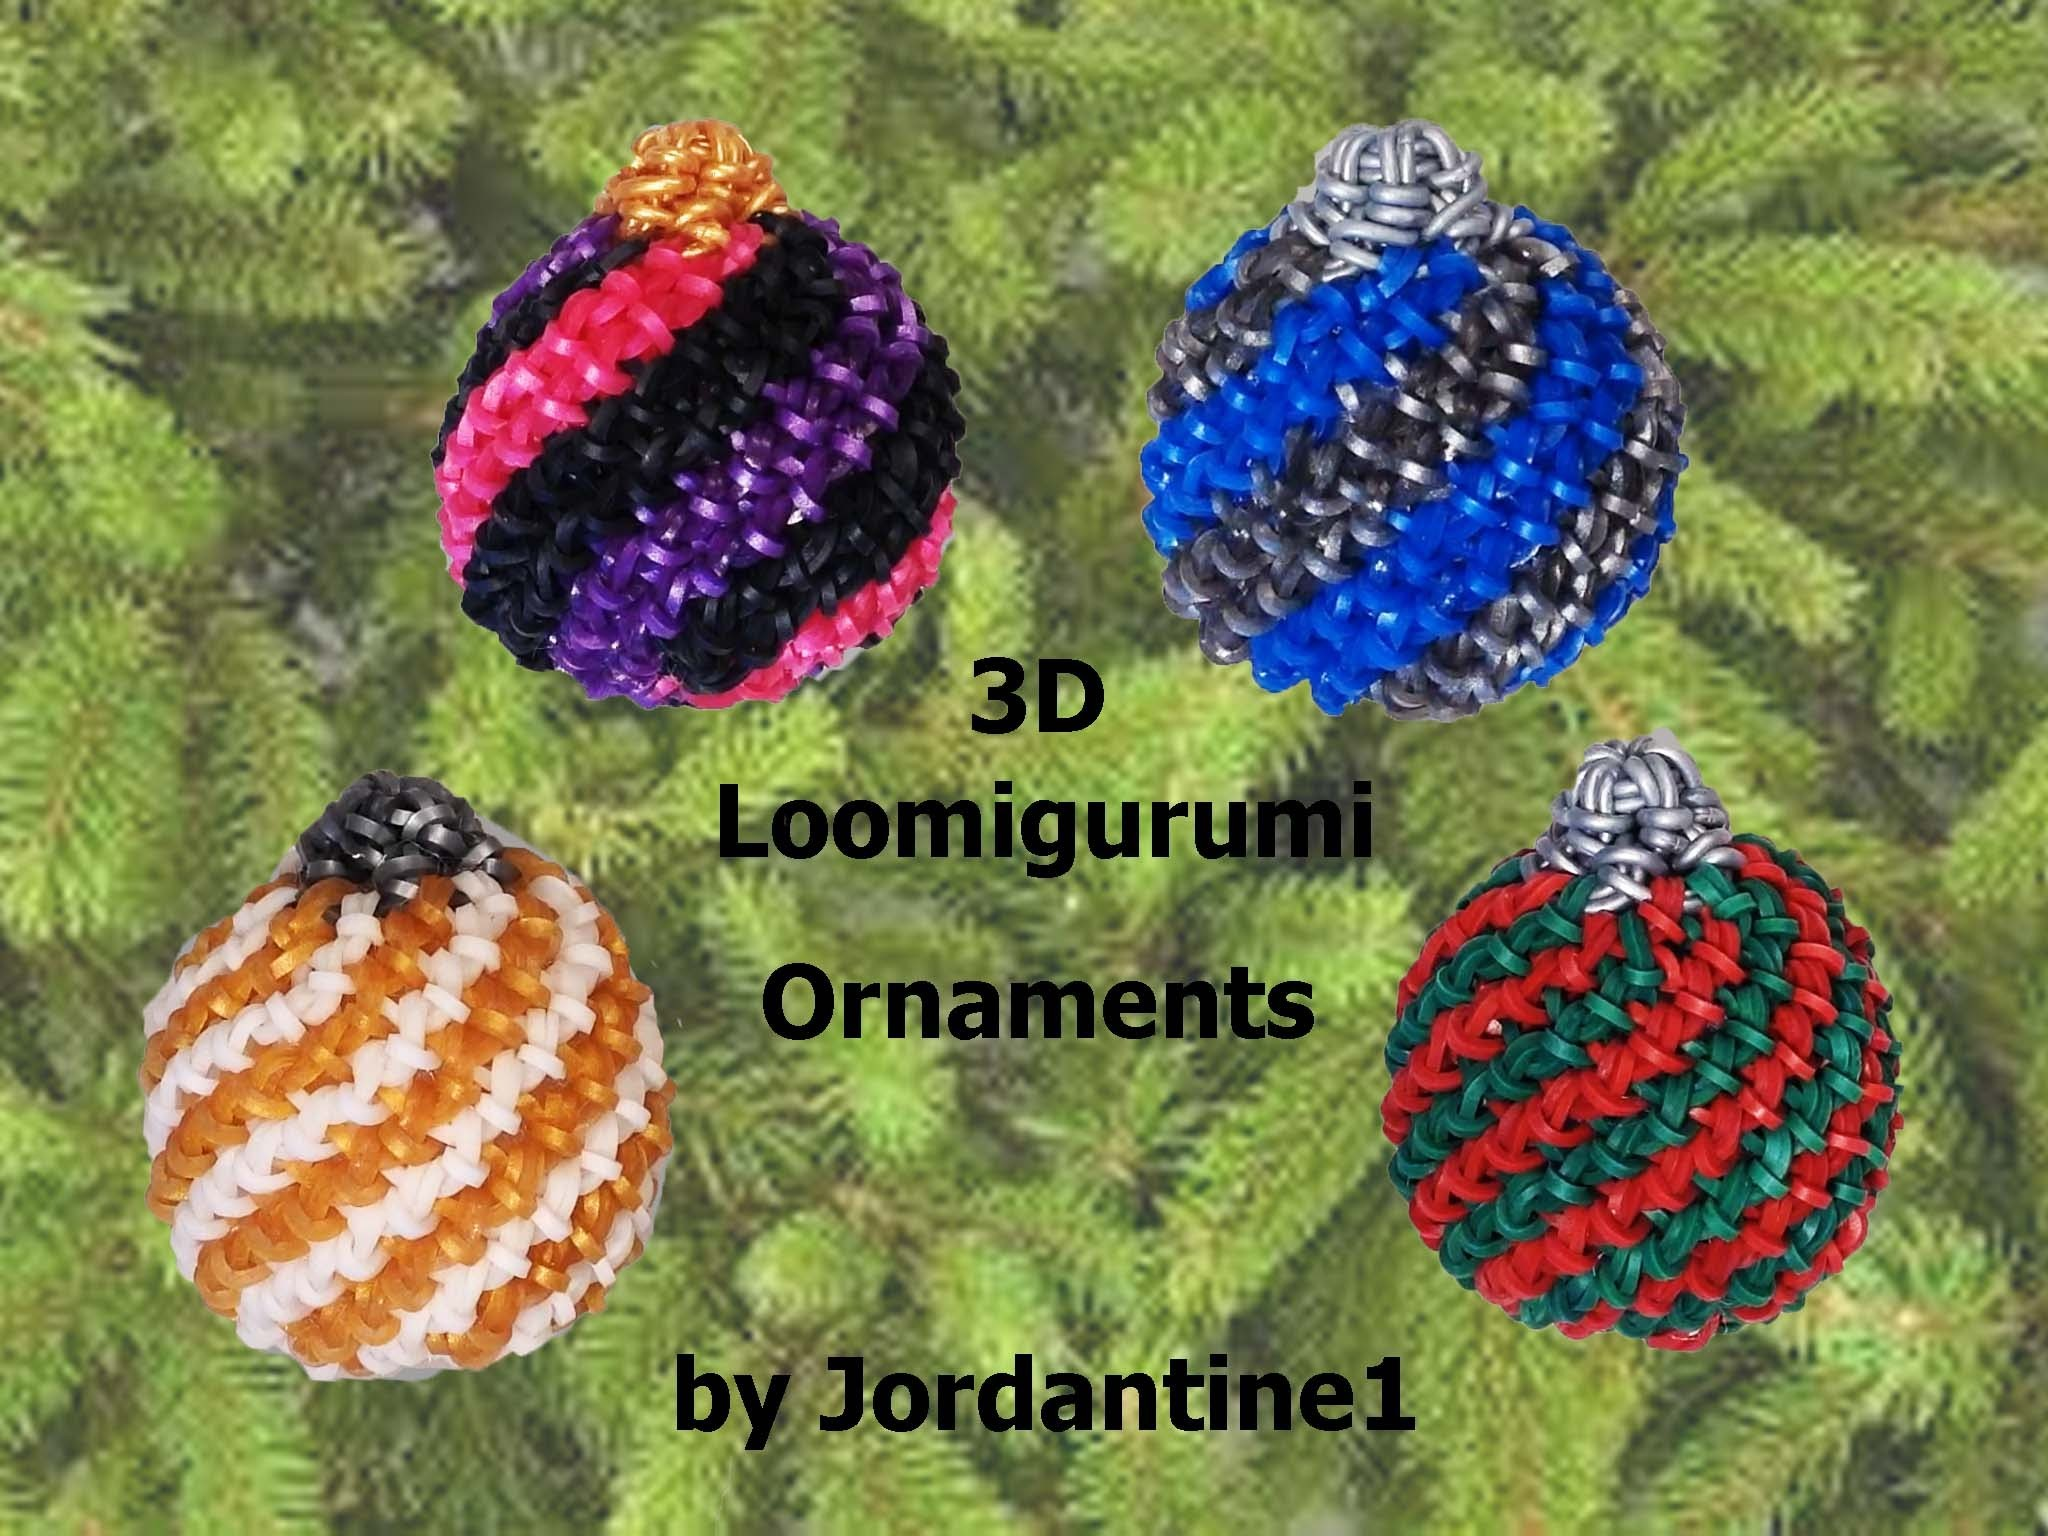 New 3D Loomigurumi. Amigurumi Christmas Ball Spiral Ornament - Hook Only - Rubber Band Crochet